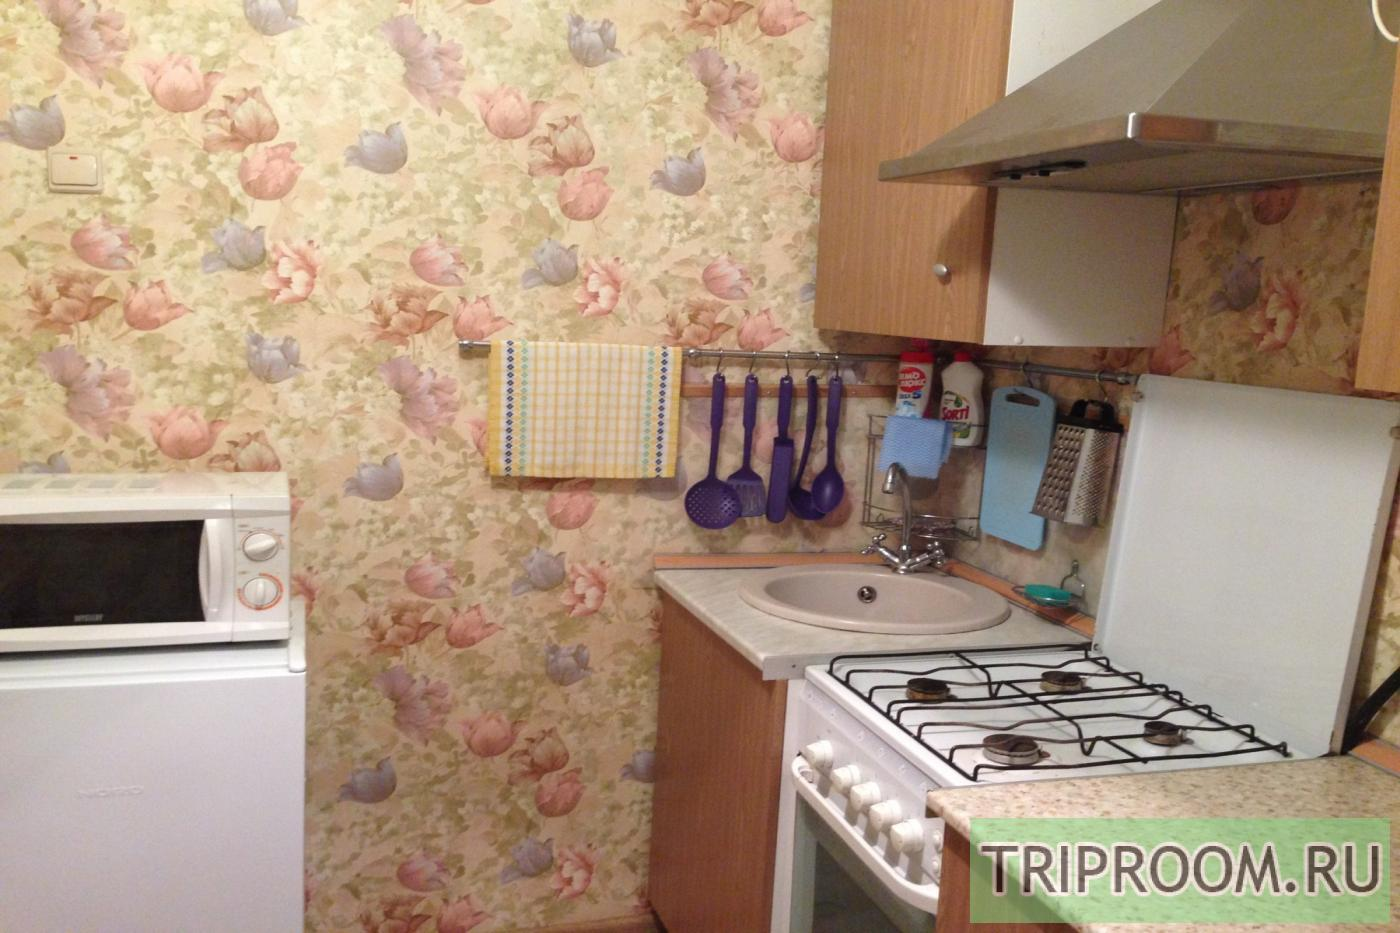 2-комнатная квартира посуточно (вариант № 20611), ул. Титова улица, фото № 5